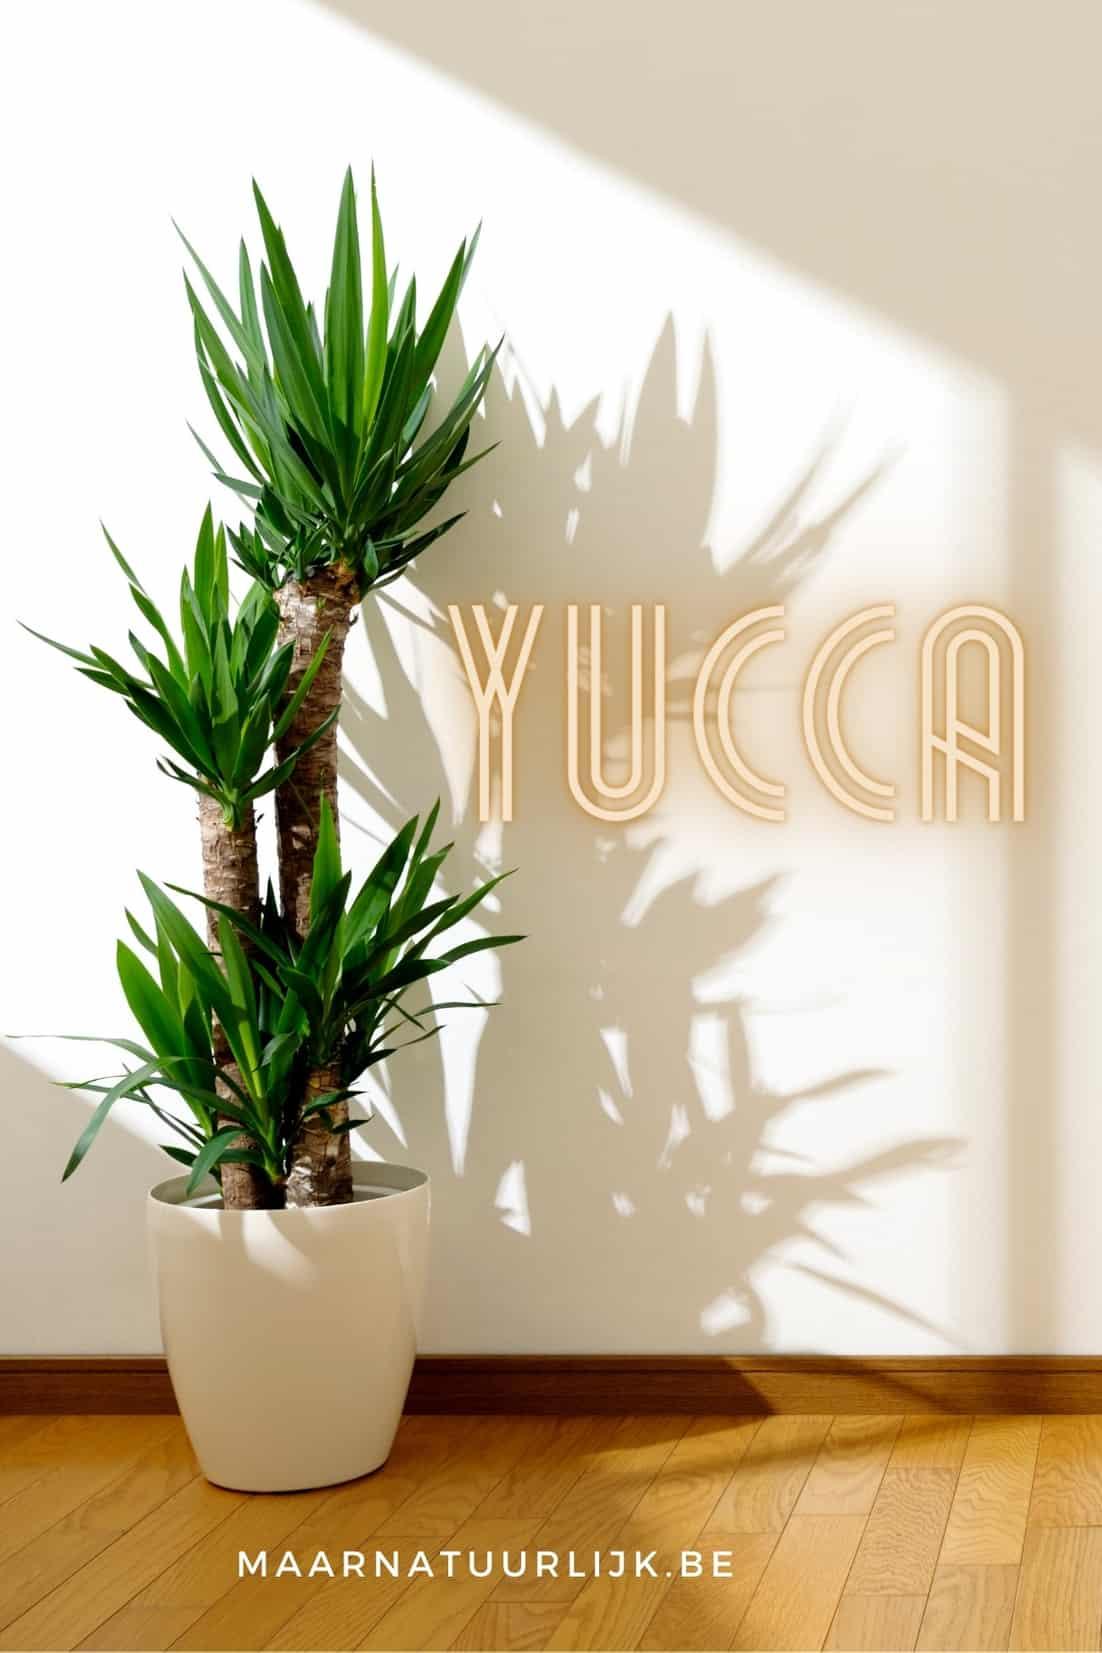 Yucca als mooie grote kamerplant